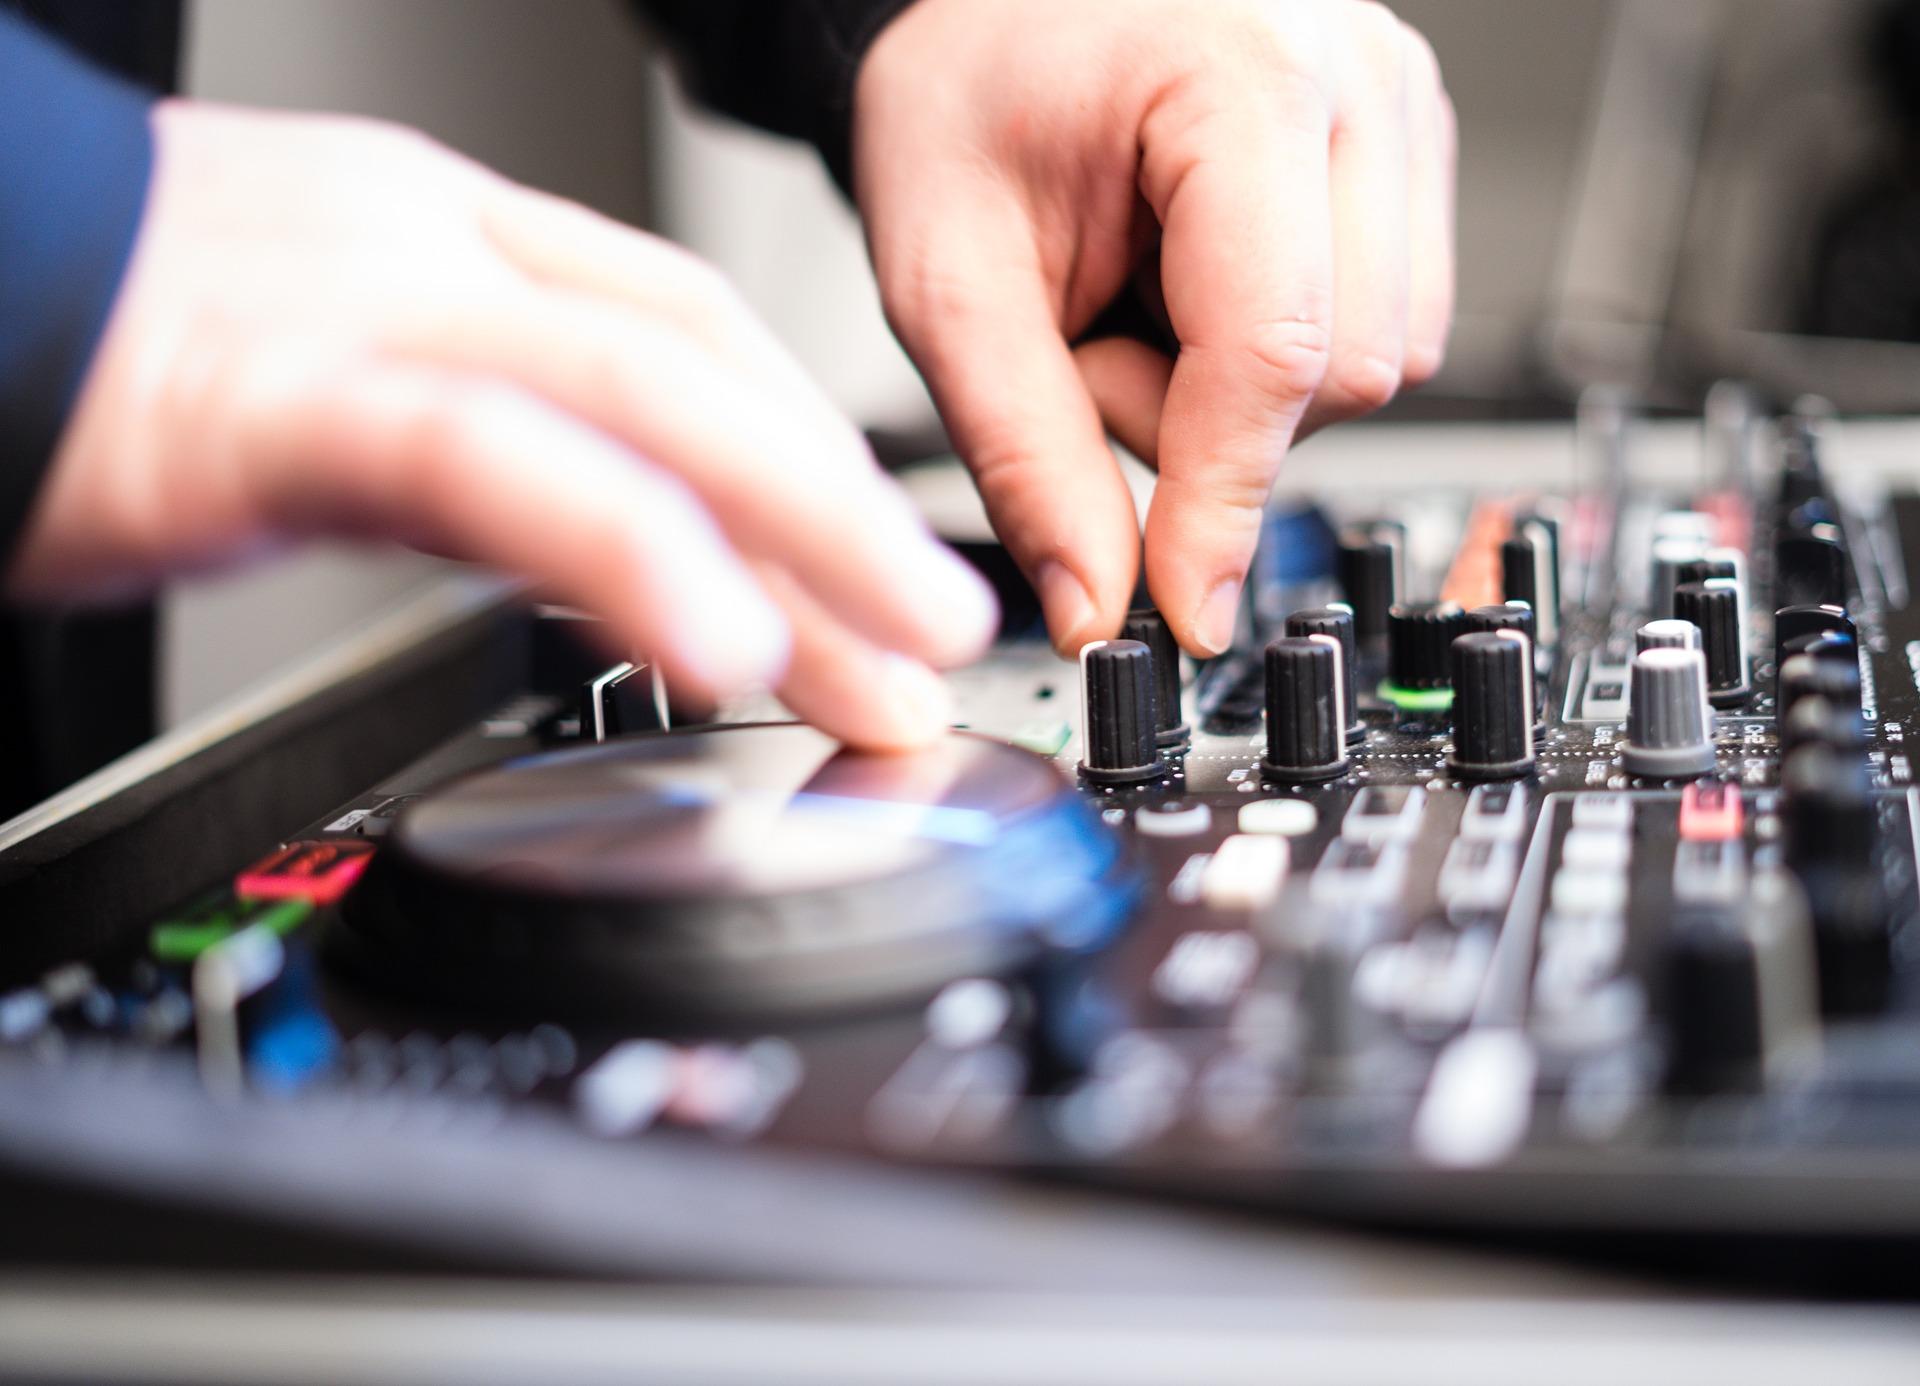 dj using controller